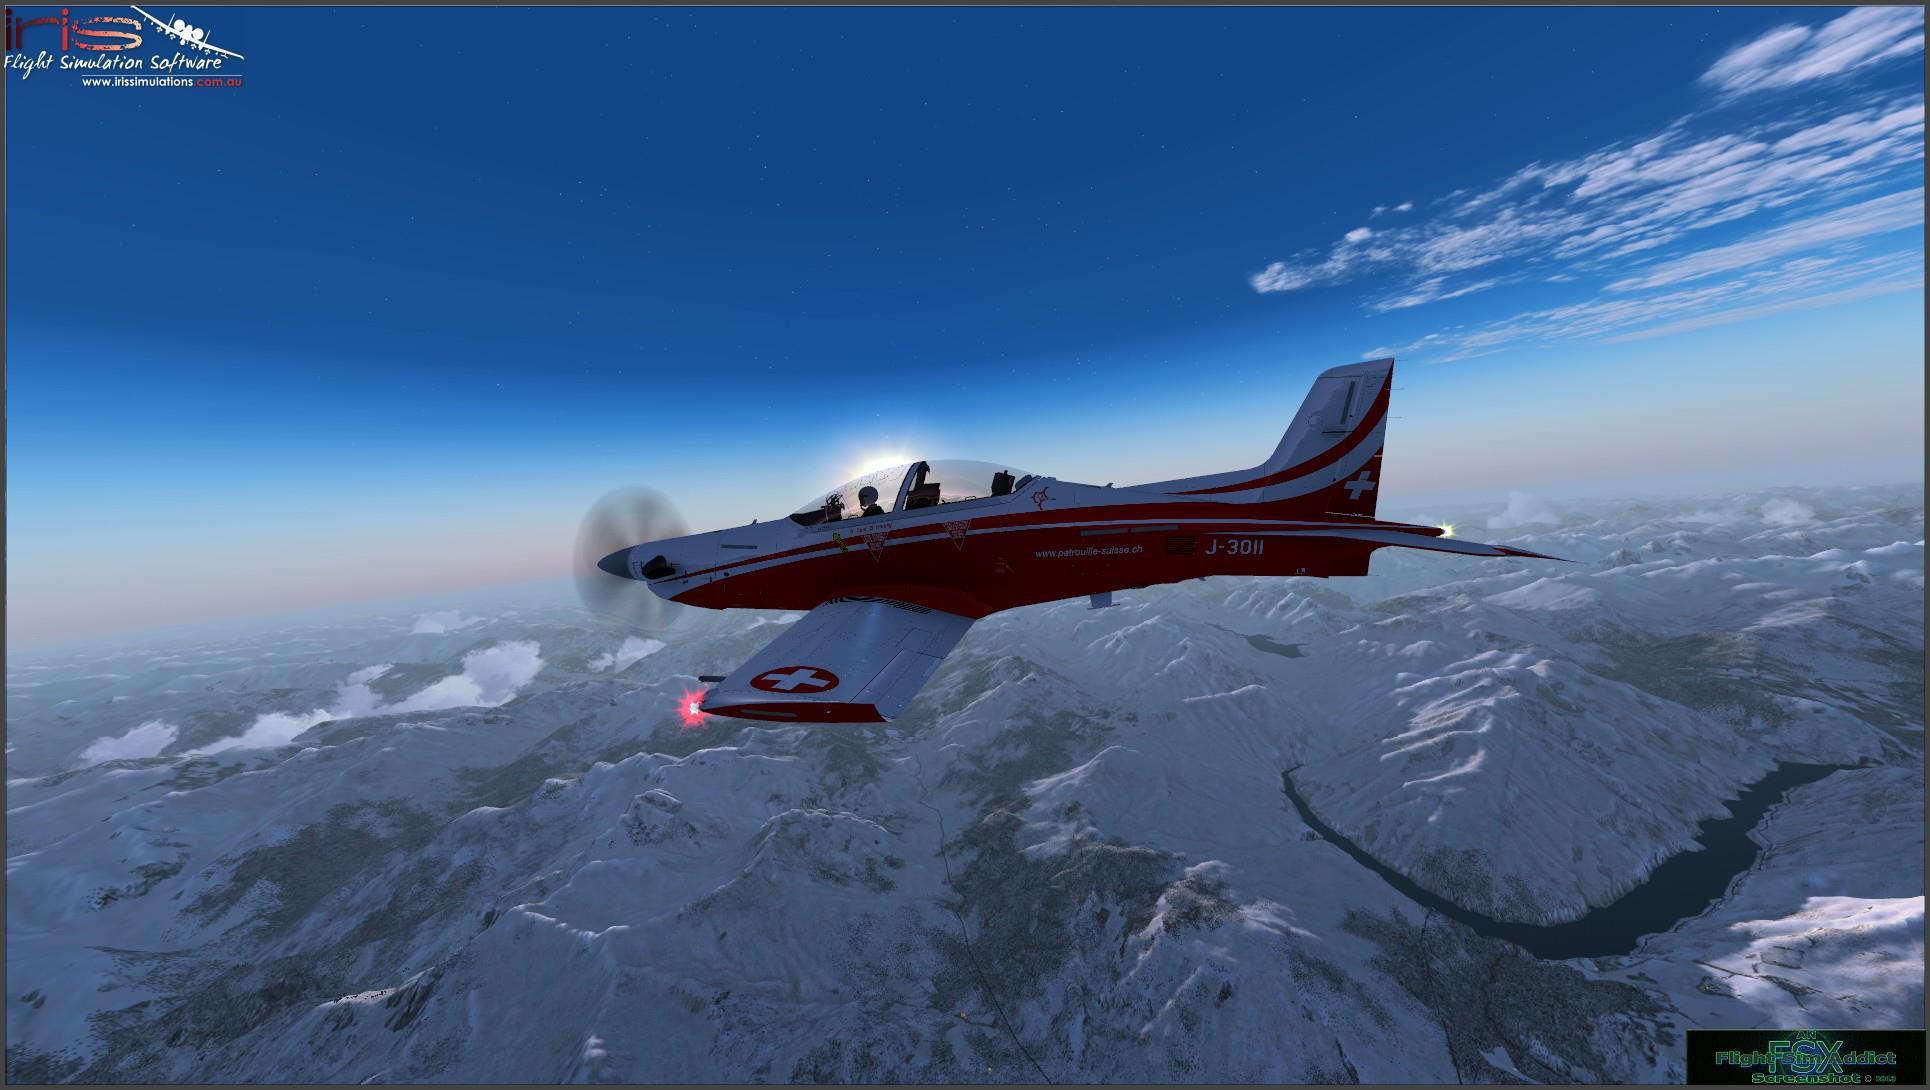 FSX Iris Pilatus PC 21 V 2 0 - portlandcrise